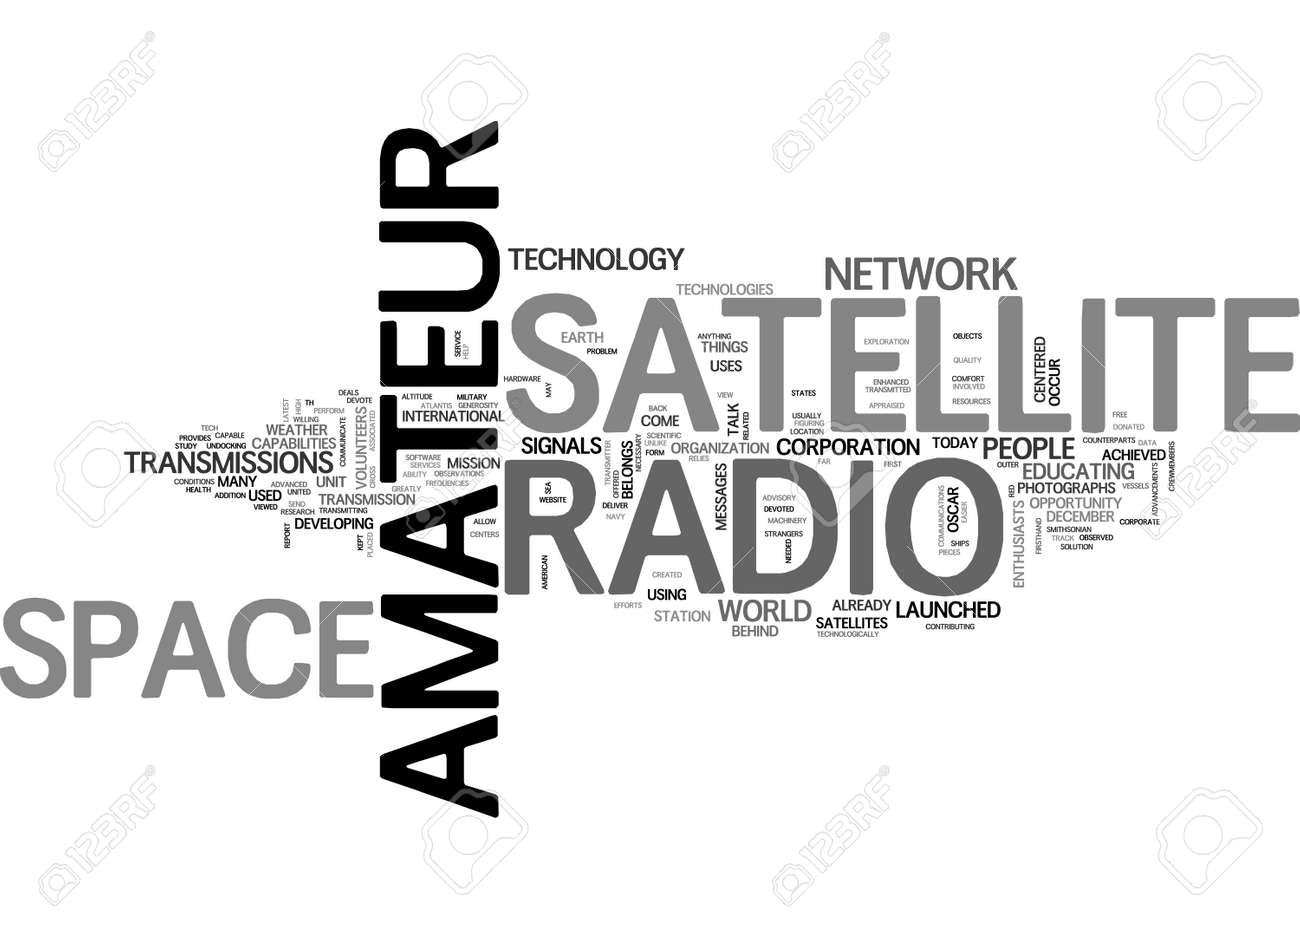 AMATEUR RADIO OPERATORS HEROES TEXT WORD CLOUD CONCEPT - 79498338